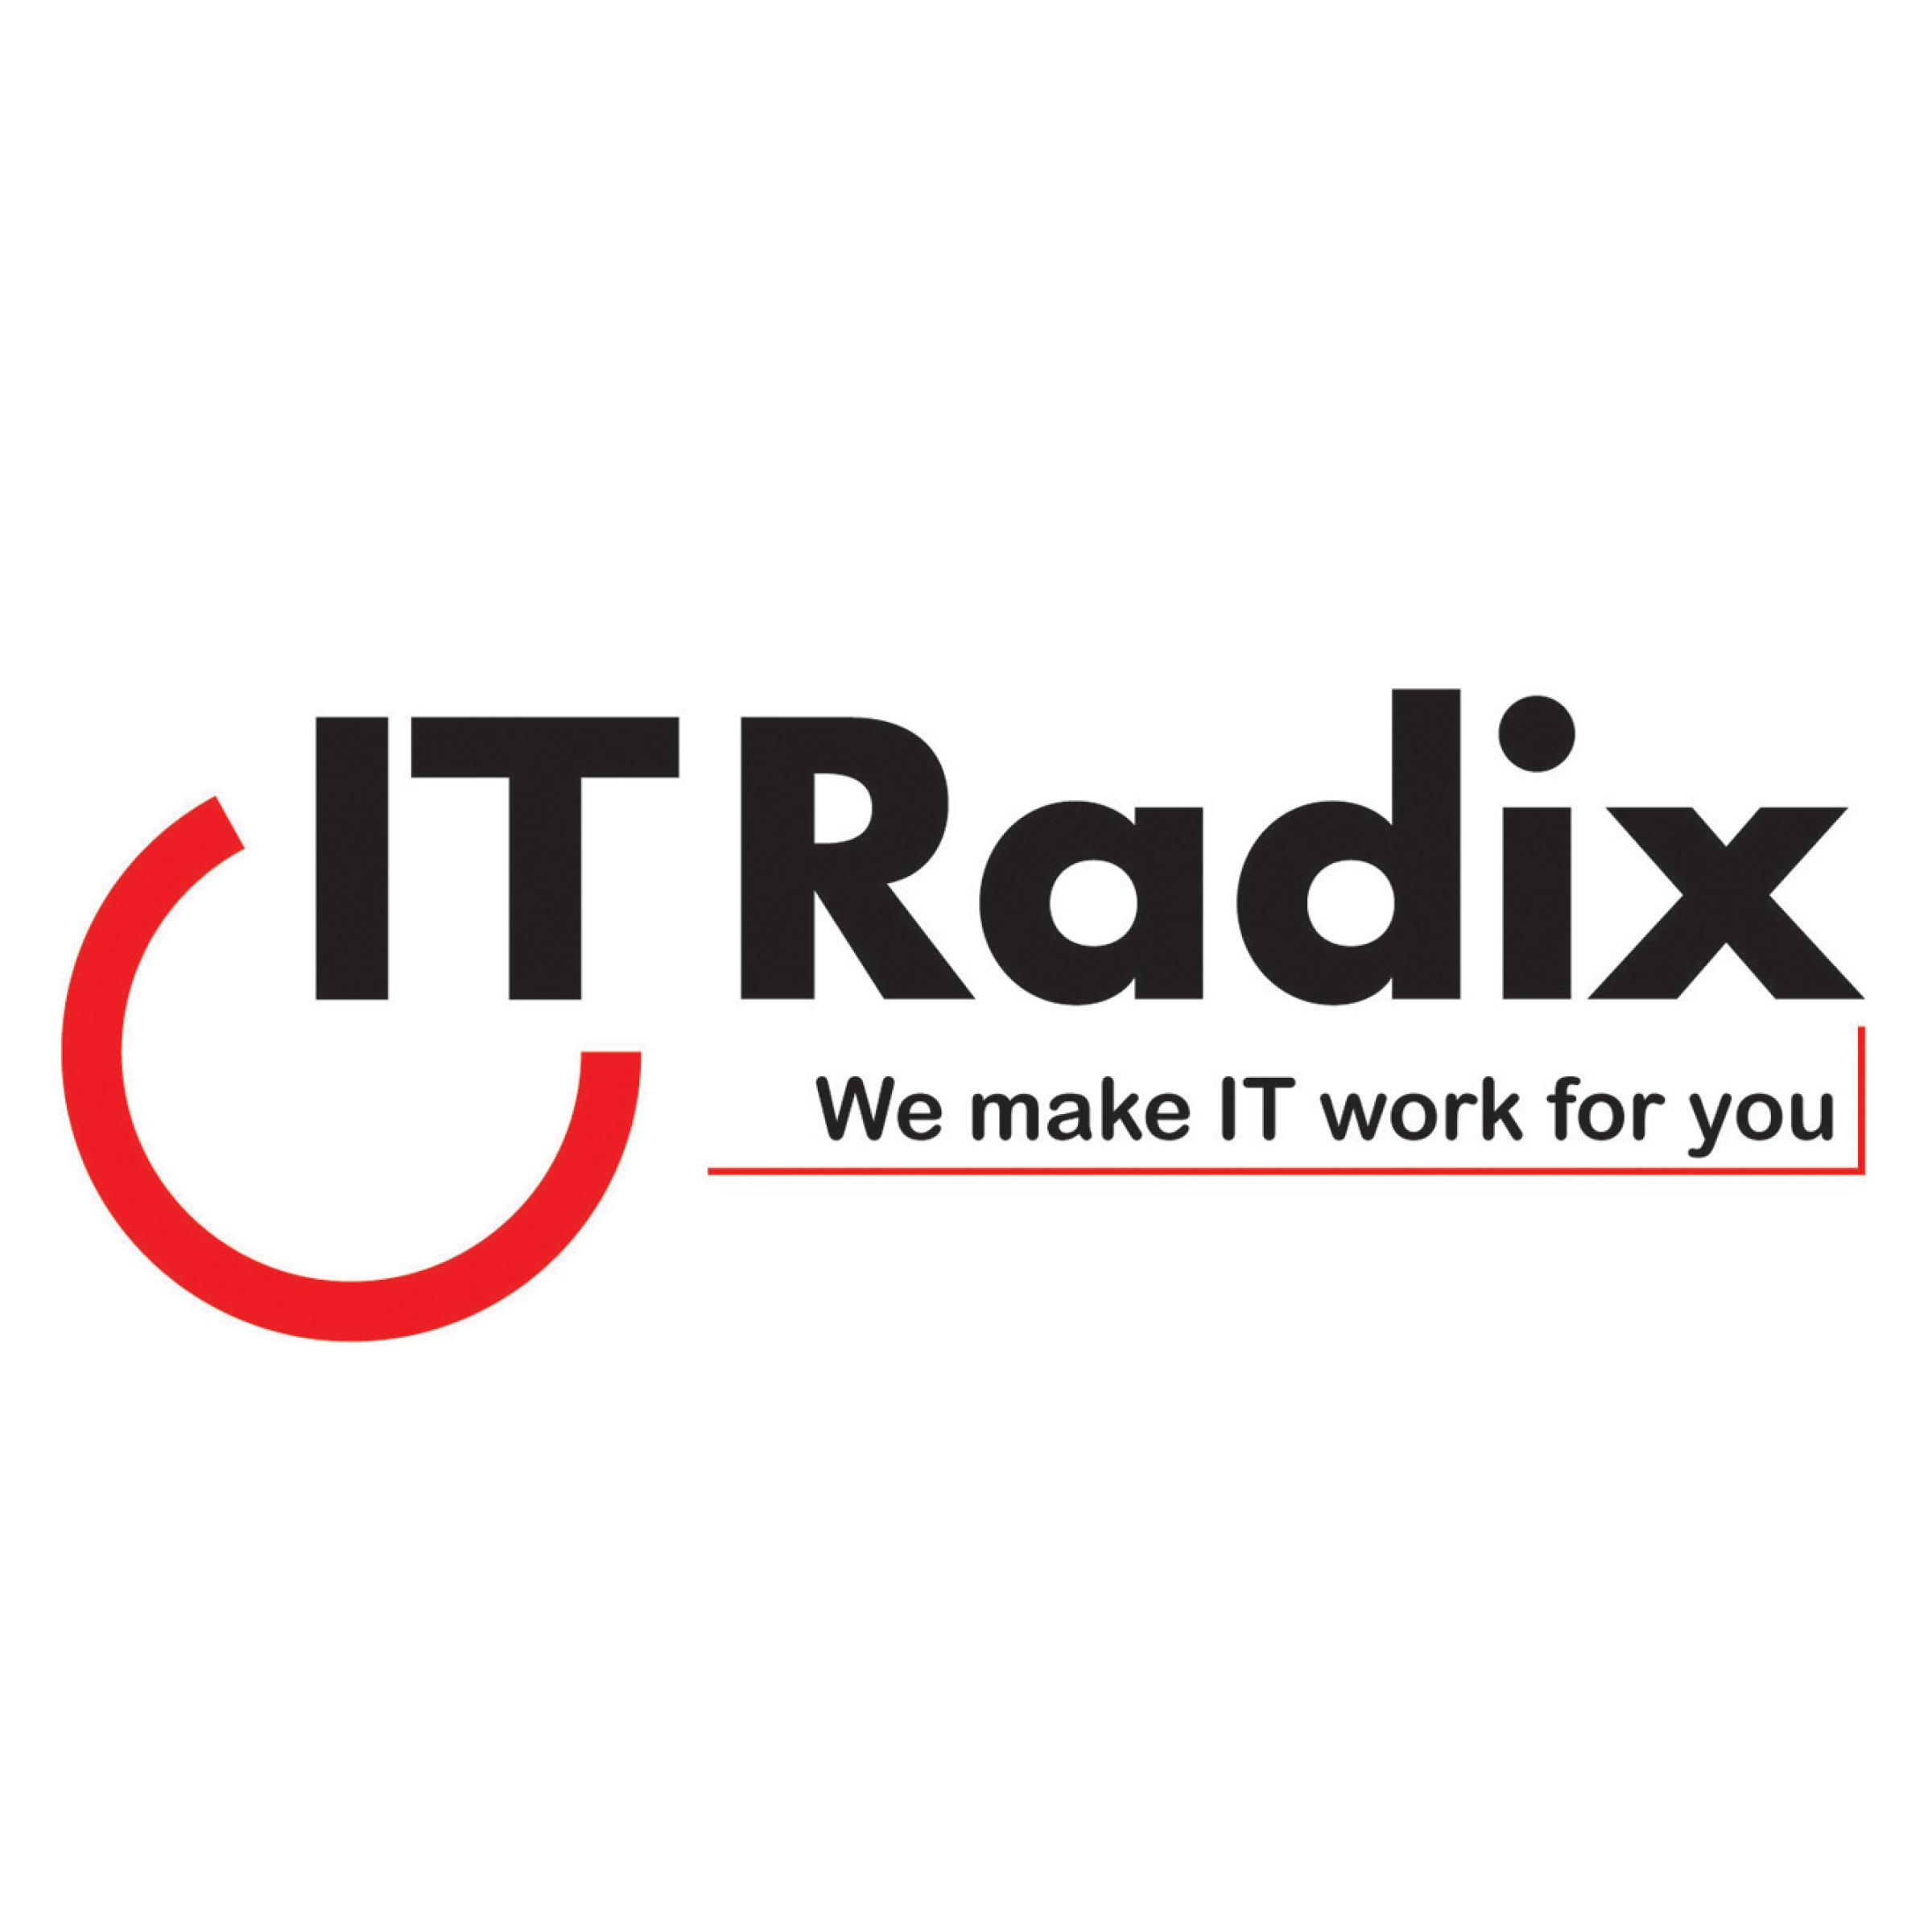 ITRadix